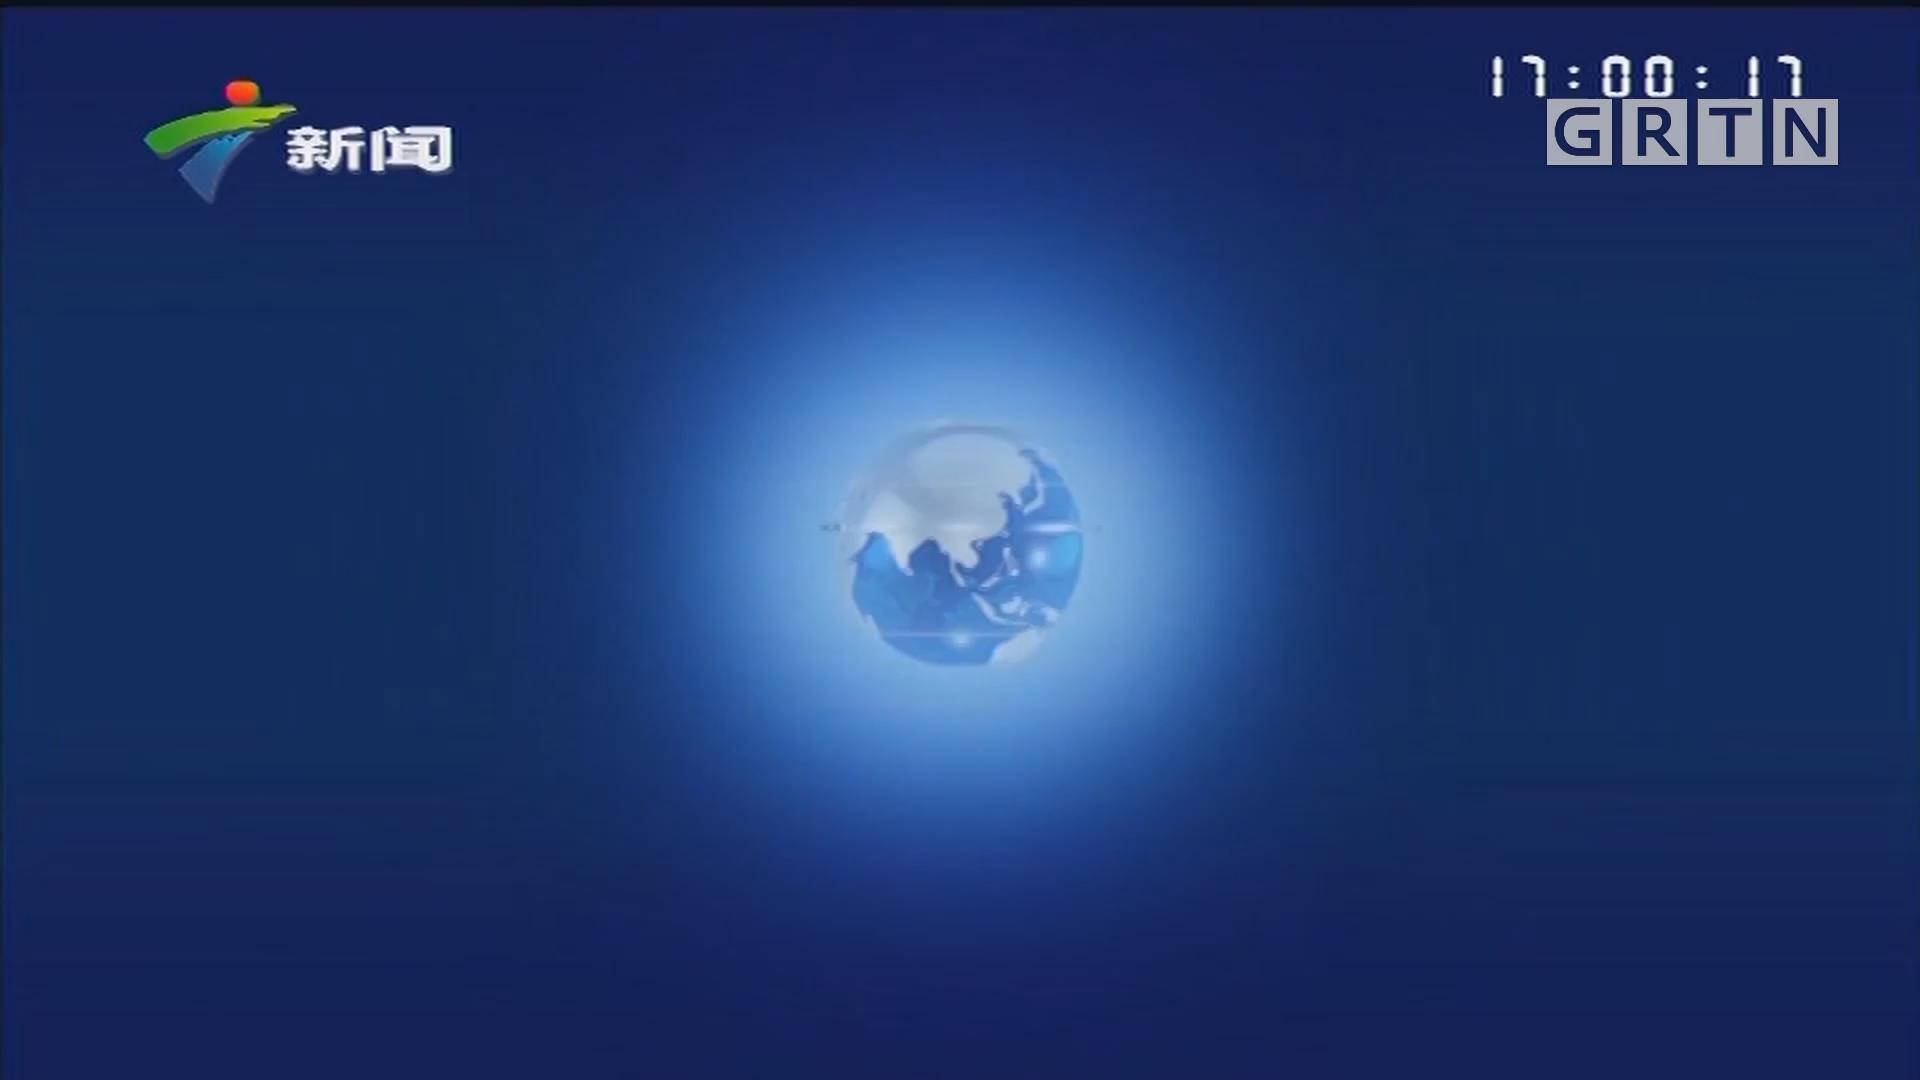 [HD][2019-11-14]正點播報:5G+智慧應用新場景 探索未來無限可能